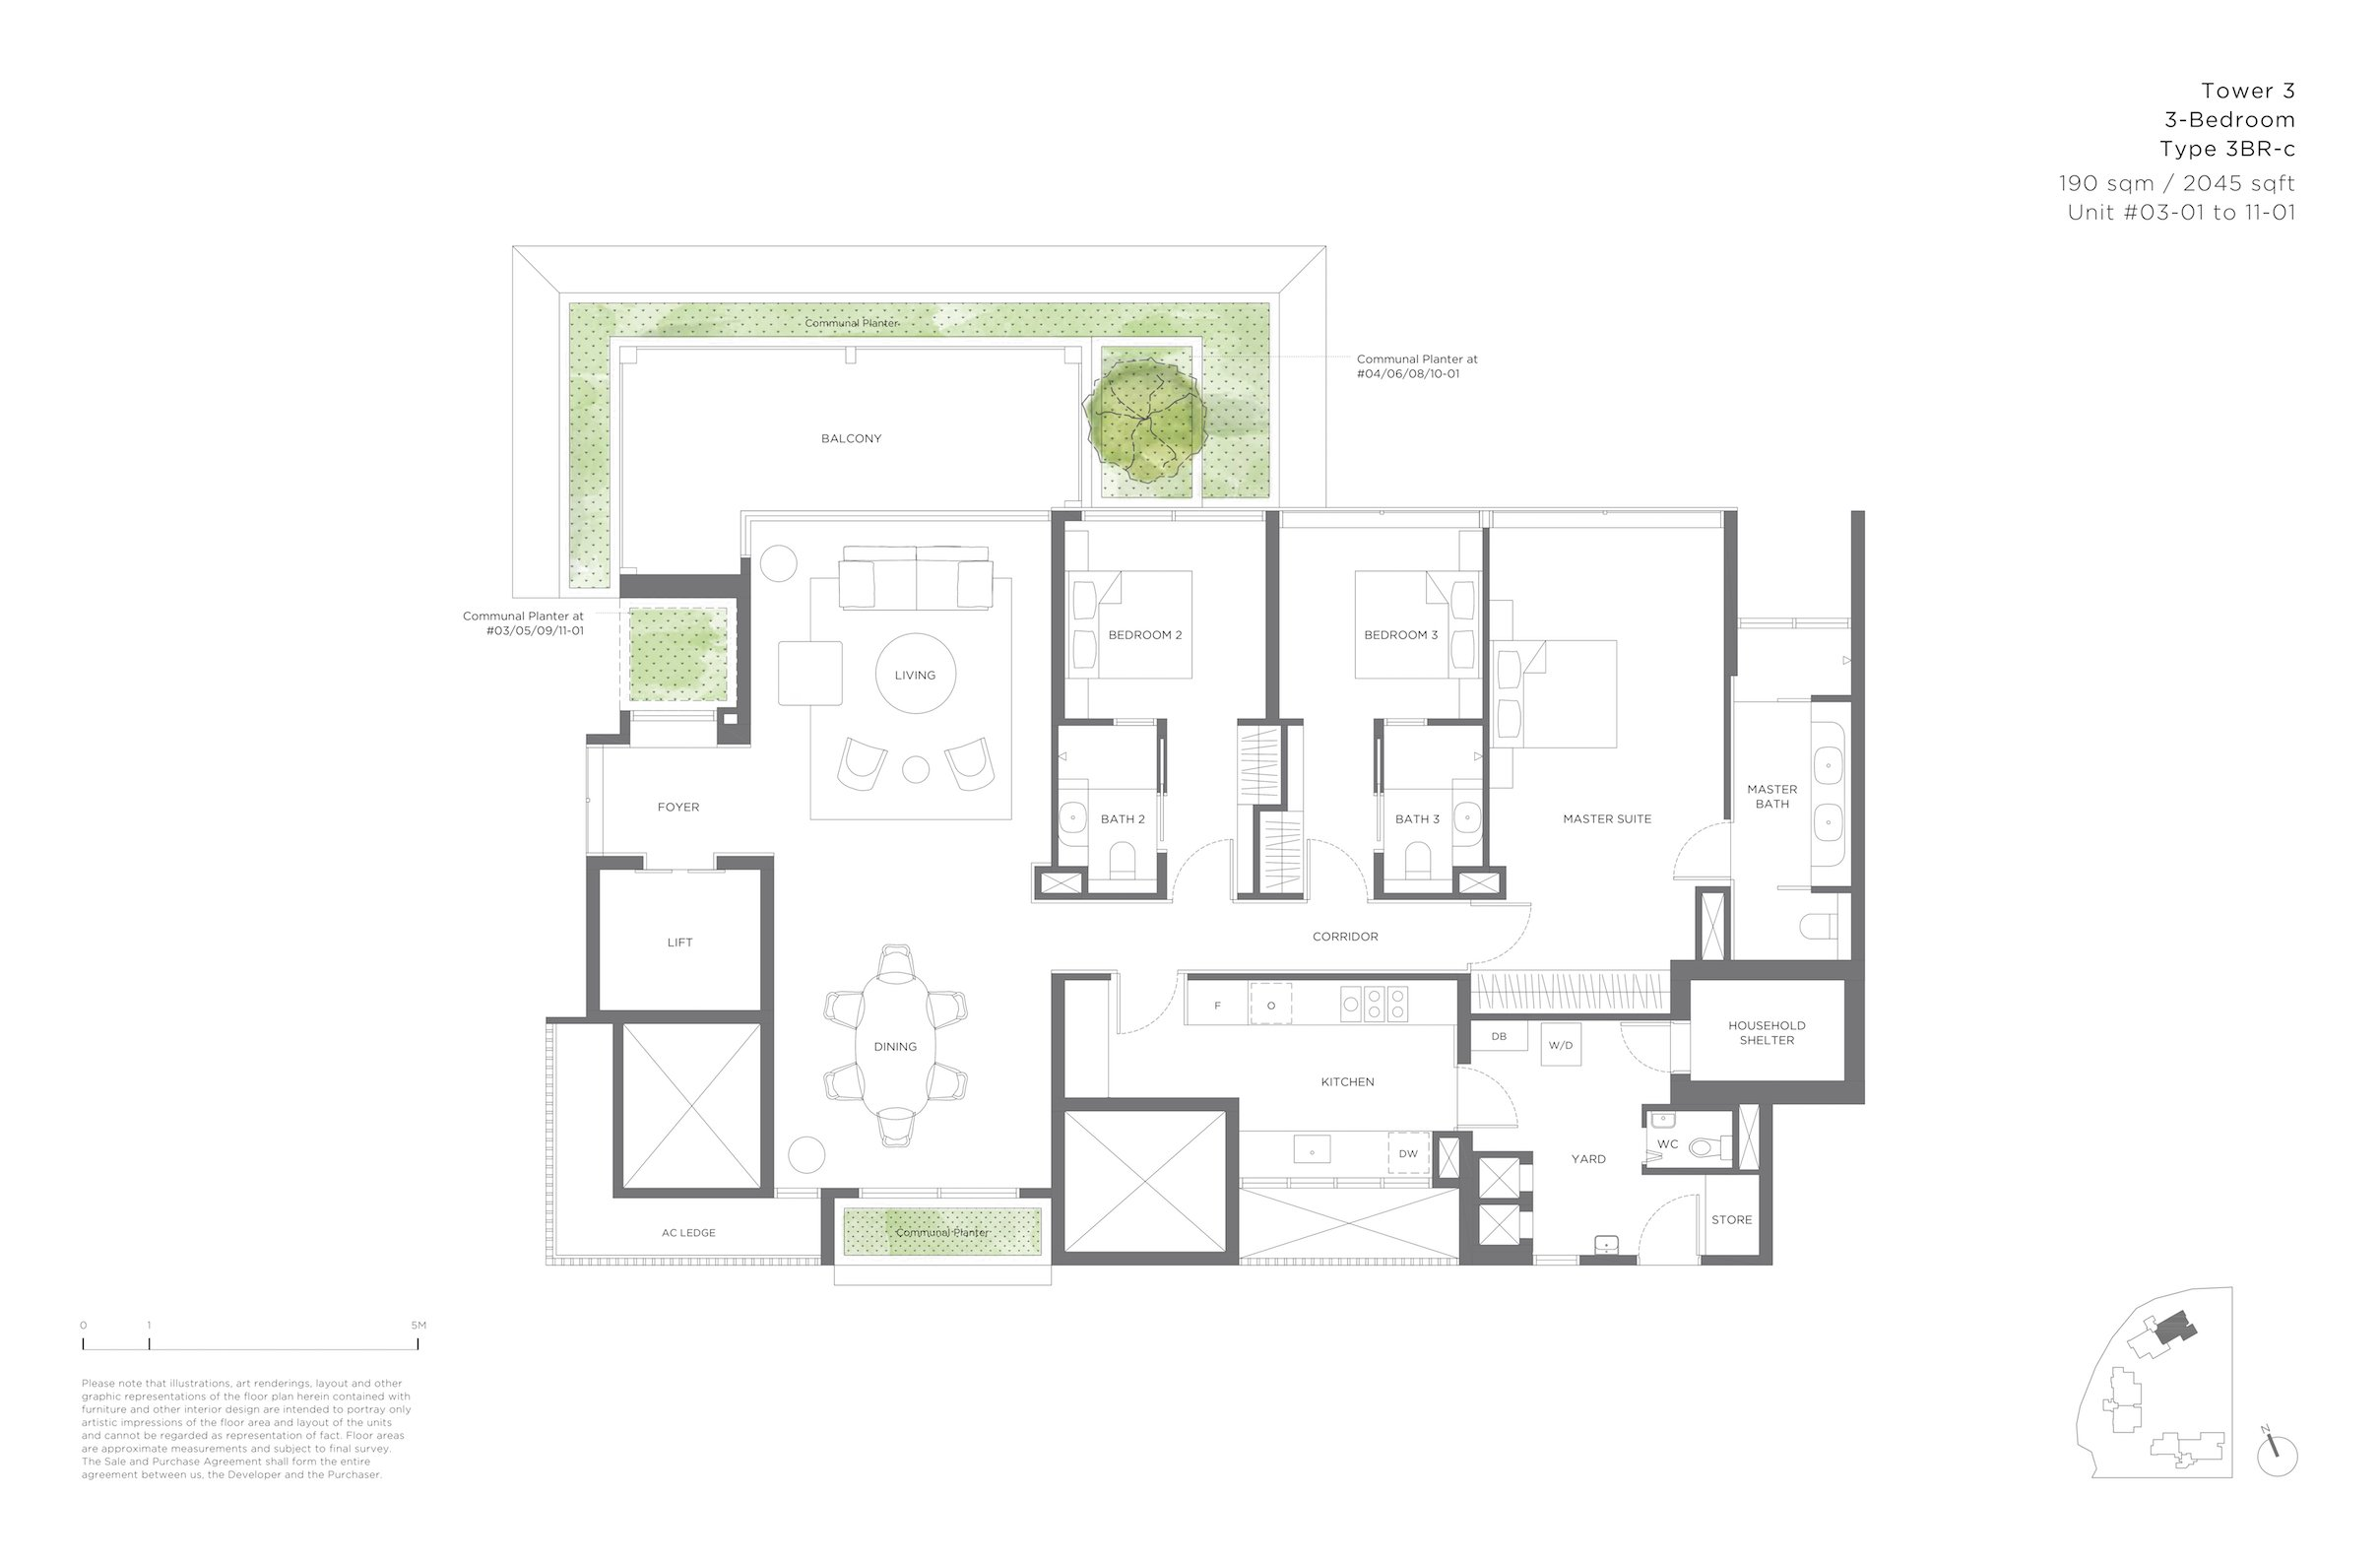 15 Holland Hill 荷兰山公寓 3-bedroom 3br-c